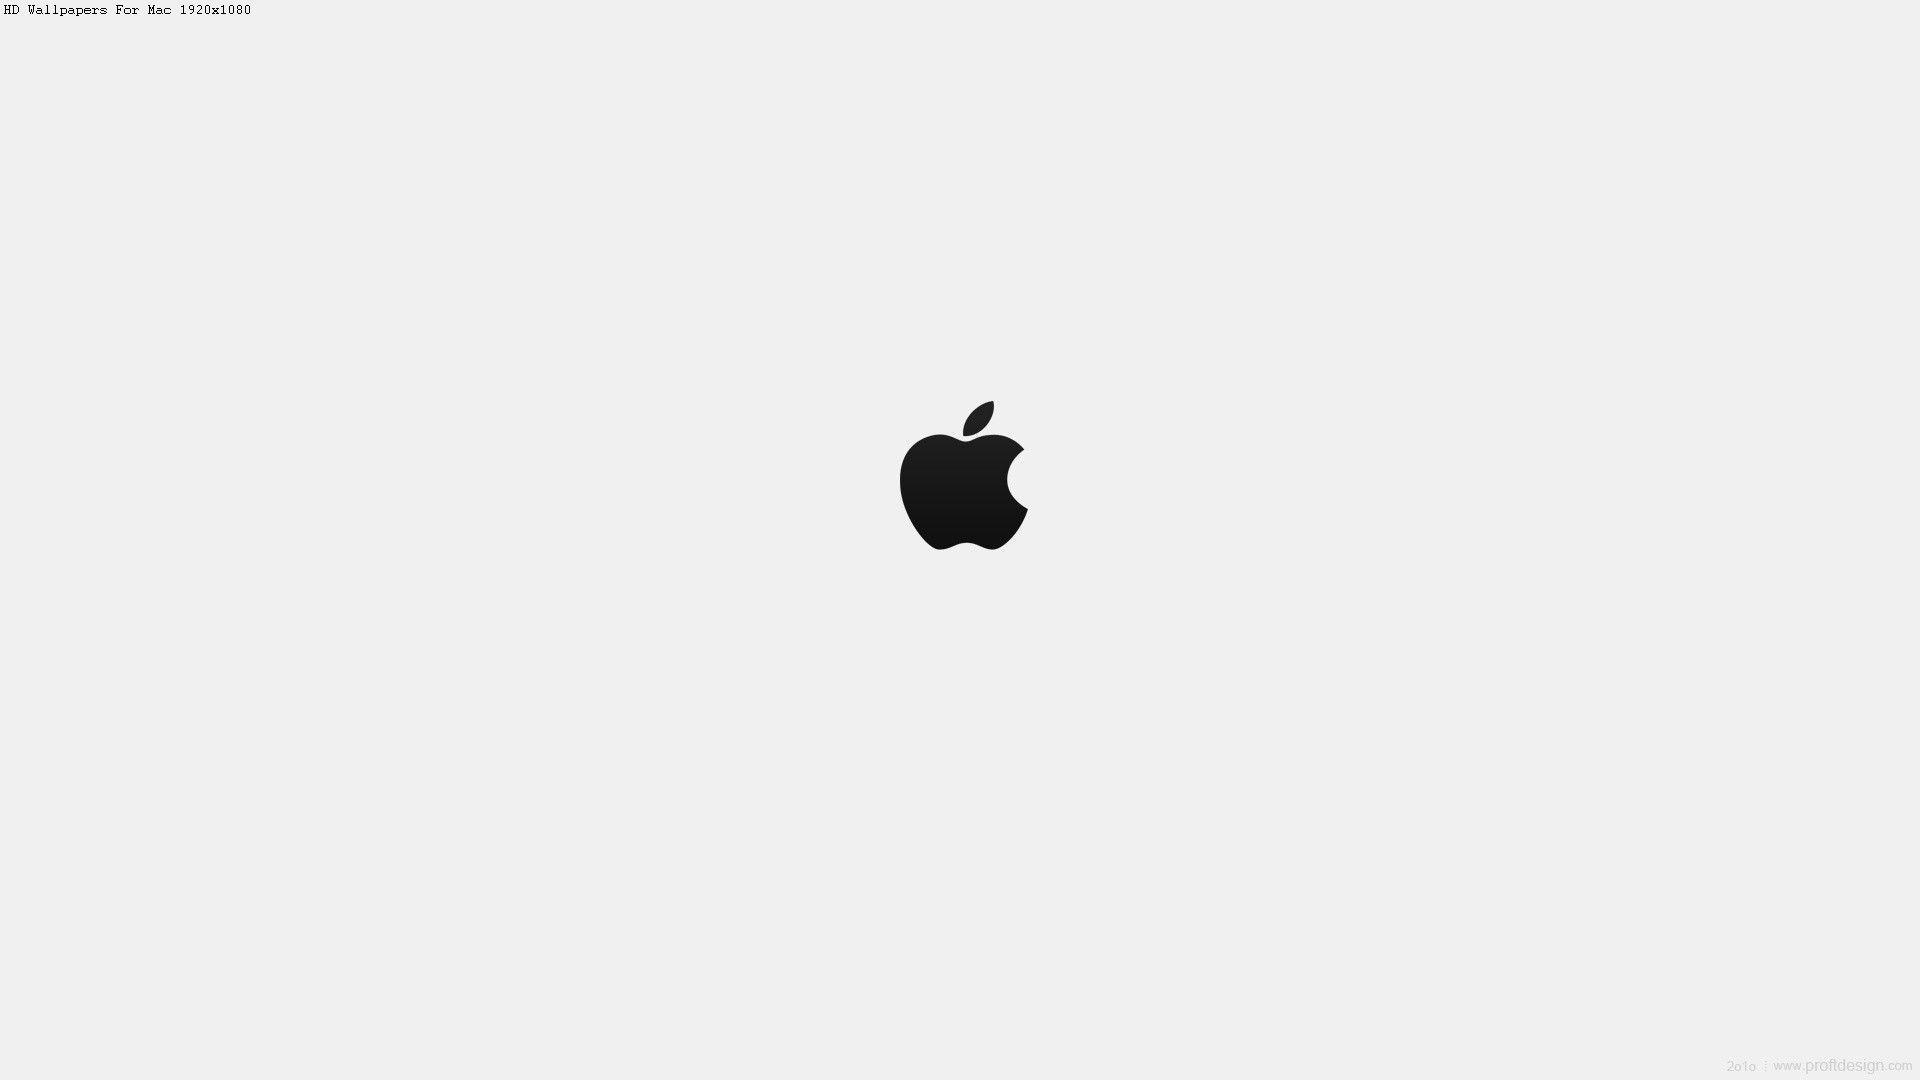 Hd Wallpapers For Mac 1920x1080 Free Download Hd Wallpapers For Mac Apple Picture Wallpaper Desktop apple wallpaper hd